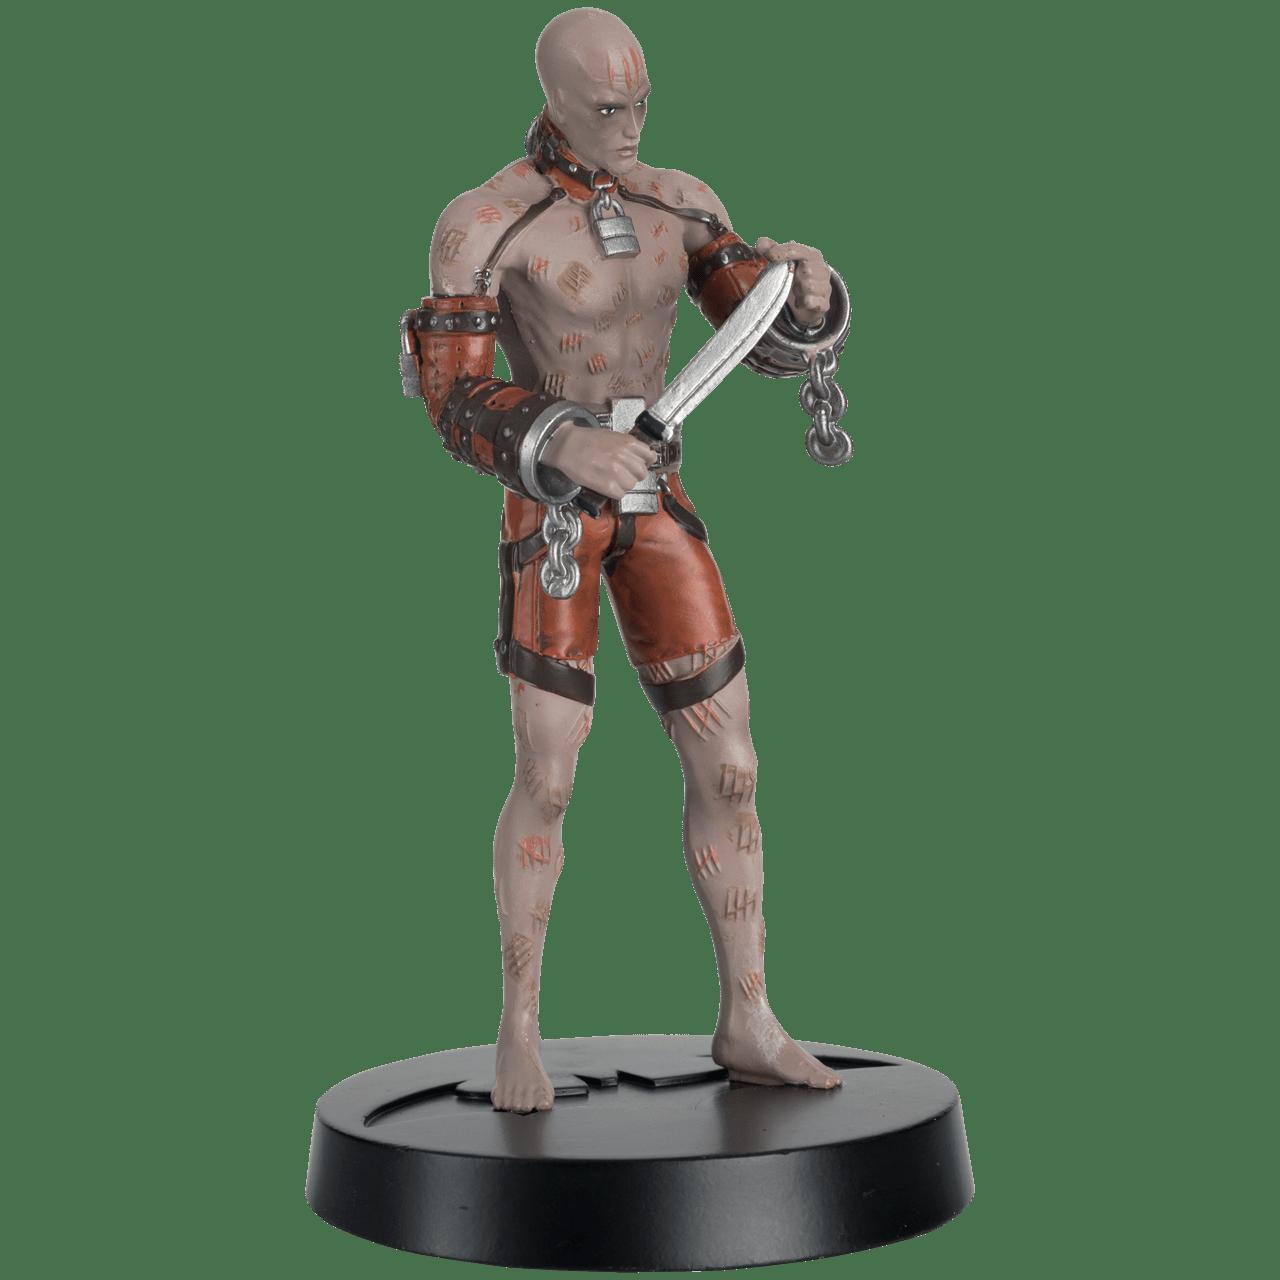 Zsasz Batman Arkham Asylum 1:16 Figurine With Magazine: Hero Collector - 3